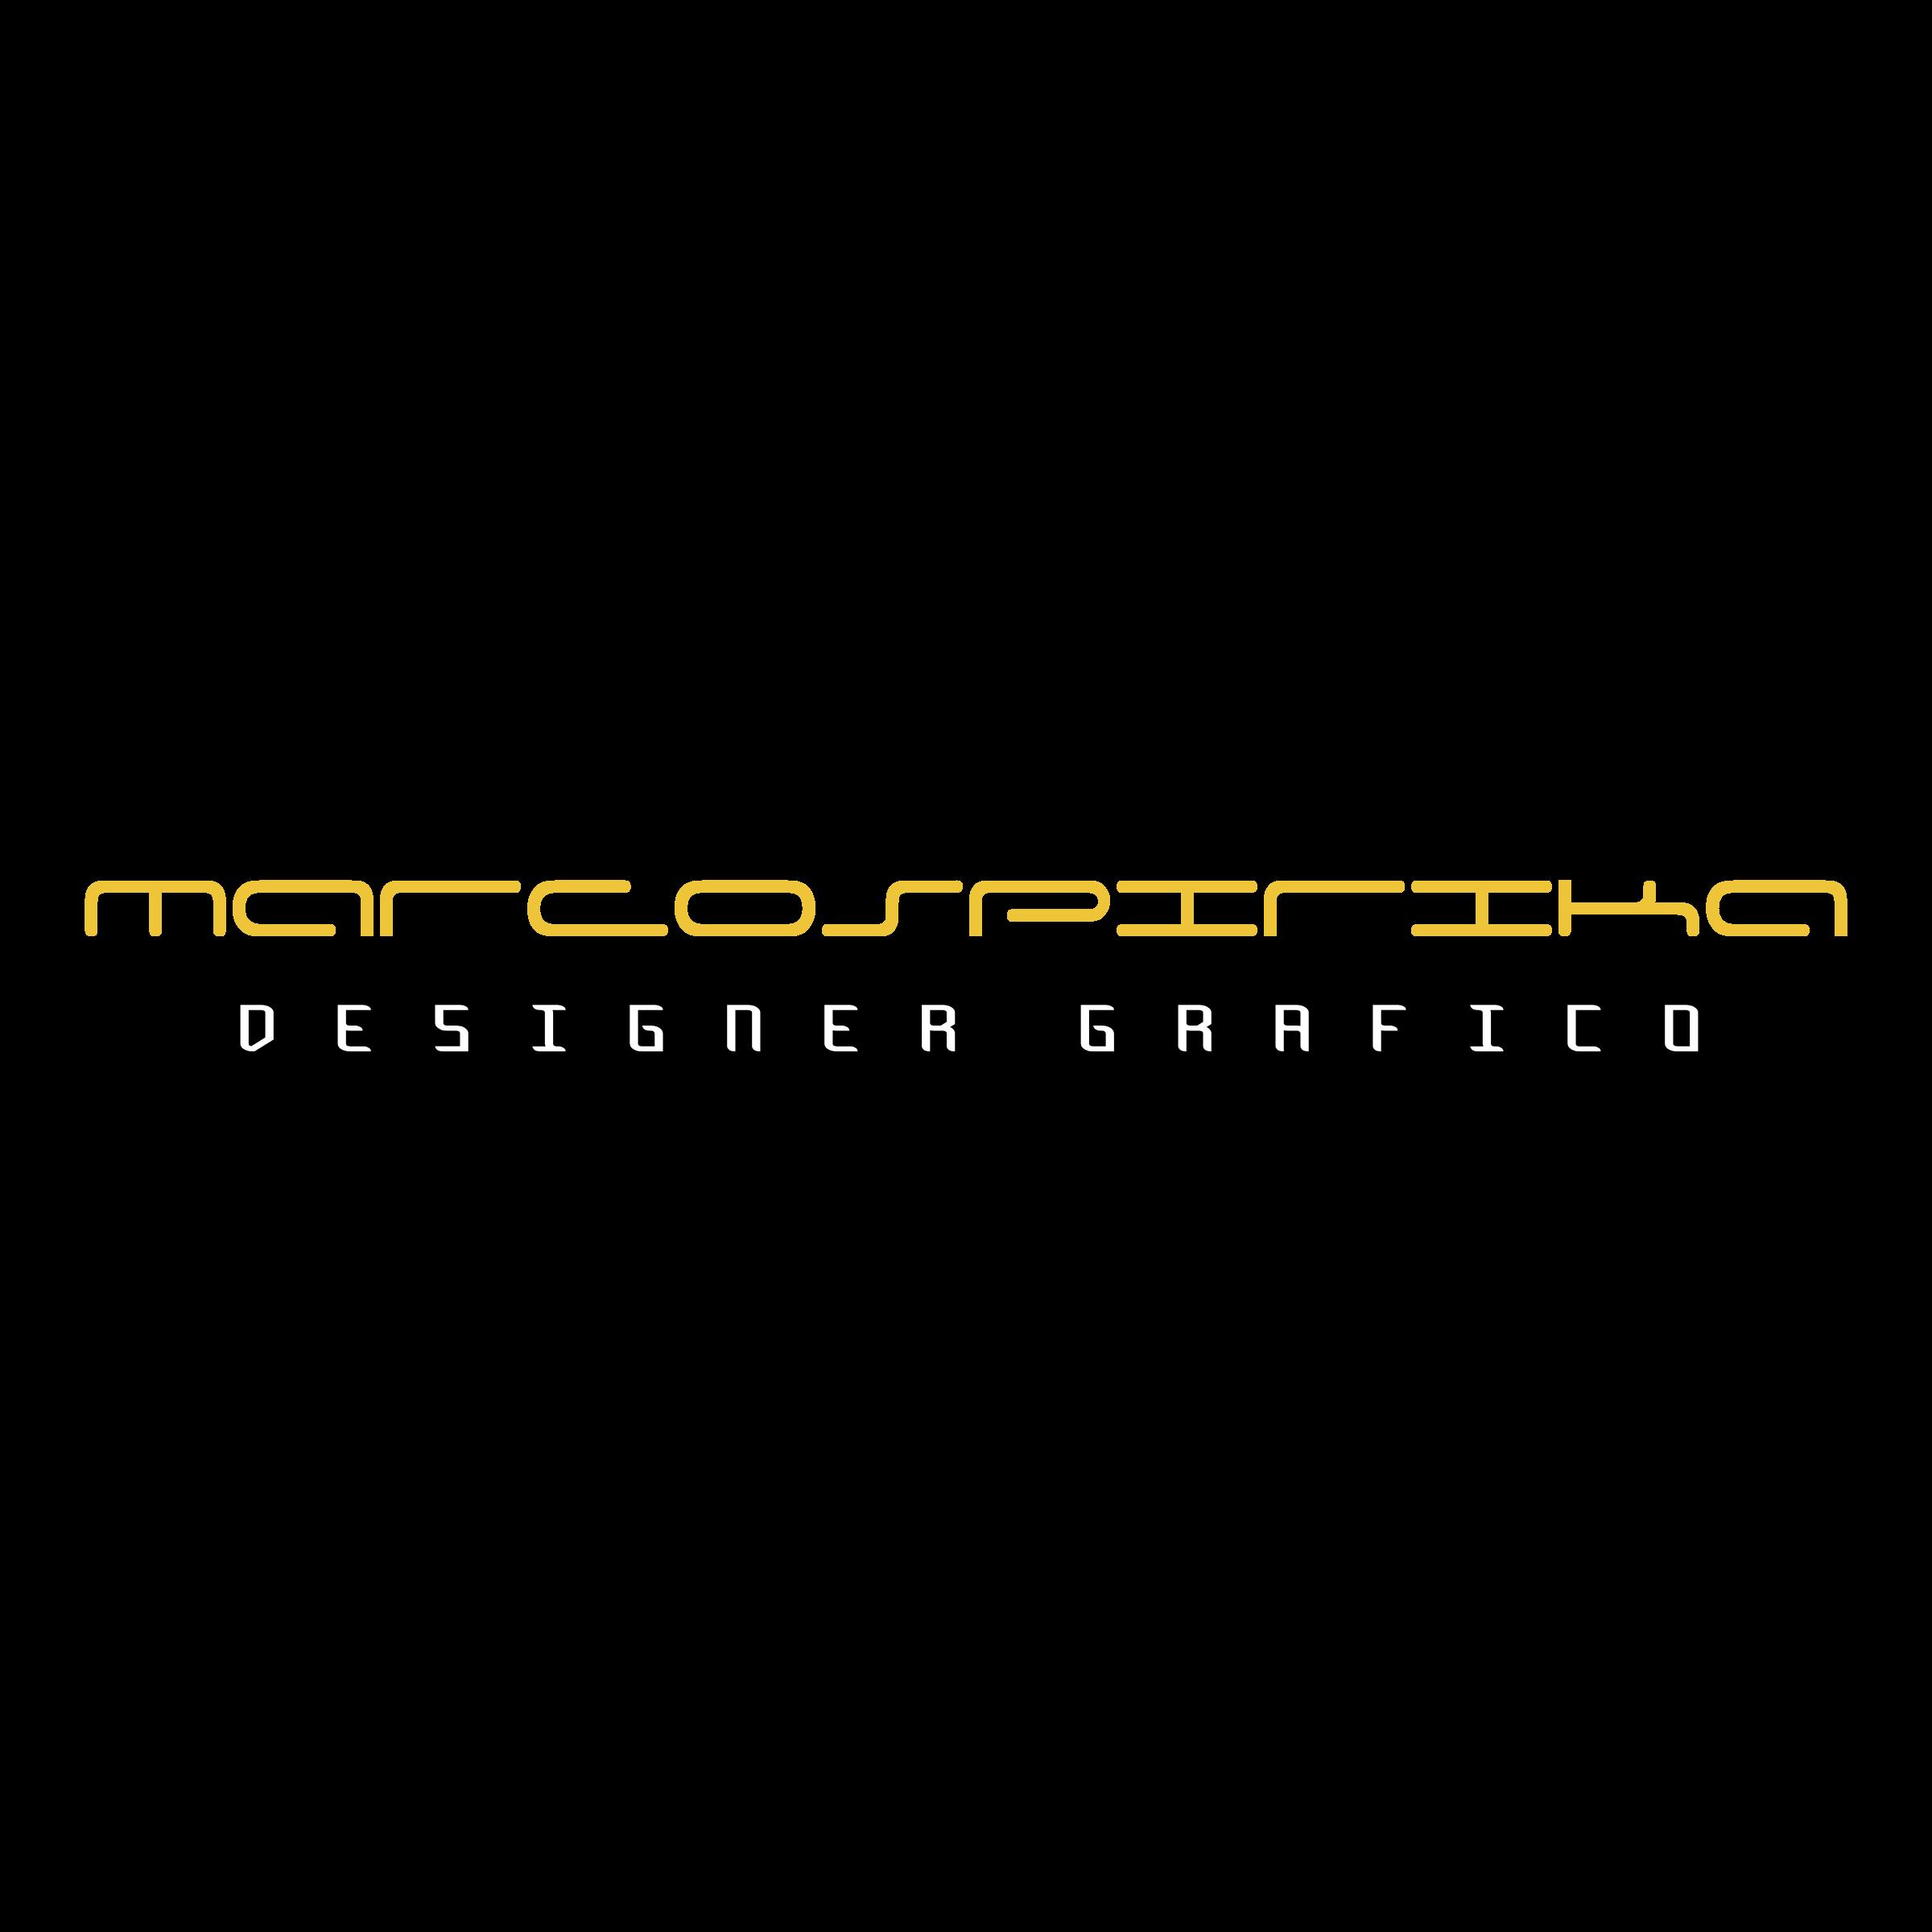 Marcos Pirika Logo PNG Transparent & SVG Vector - Freebie Supply